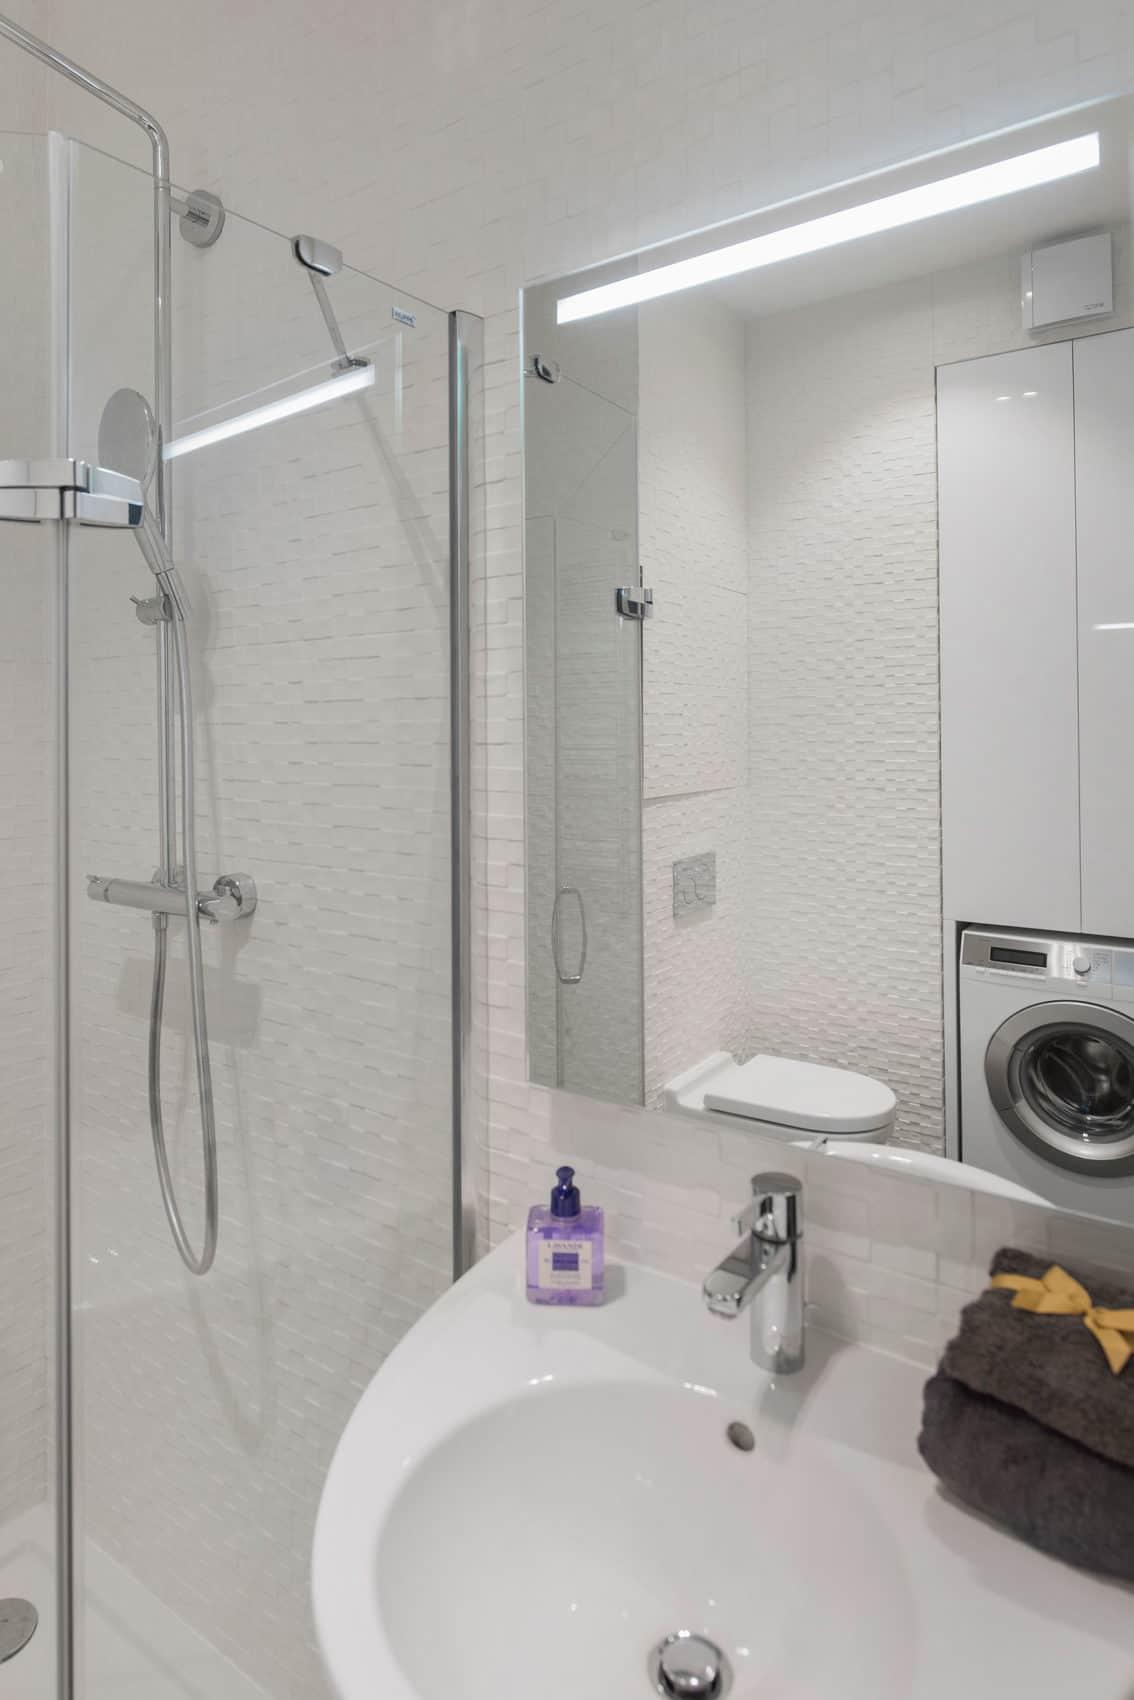 Tikhonov Dsgn Creates Tiny Apartment Interior in Moscow (18)